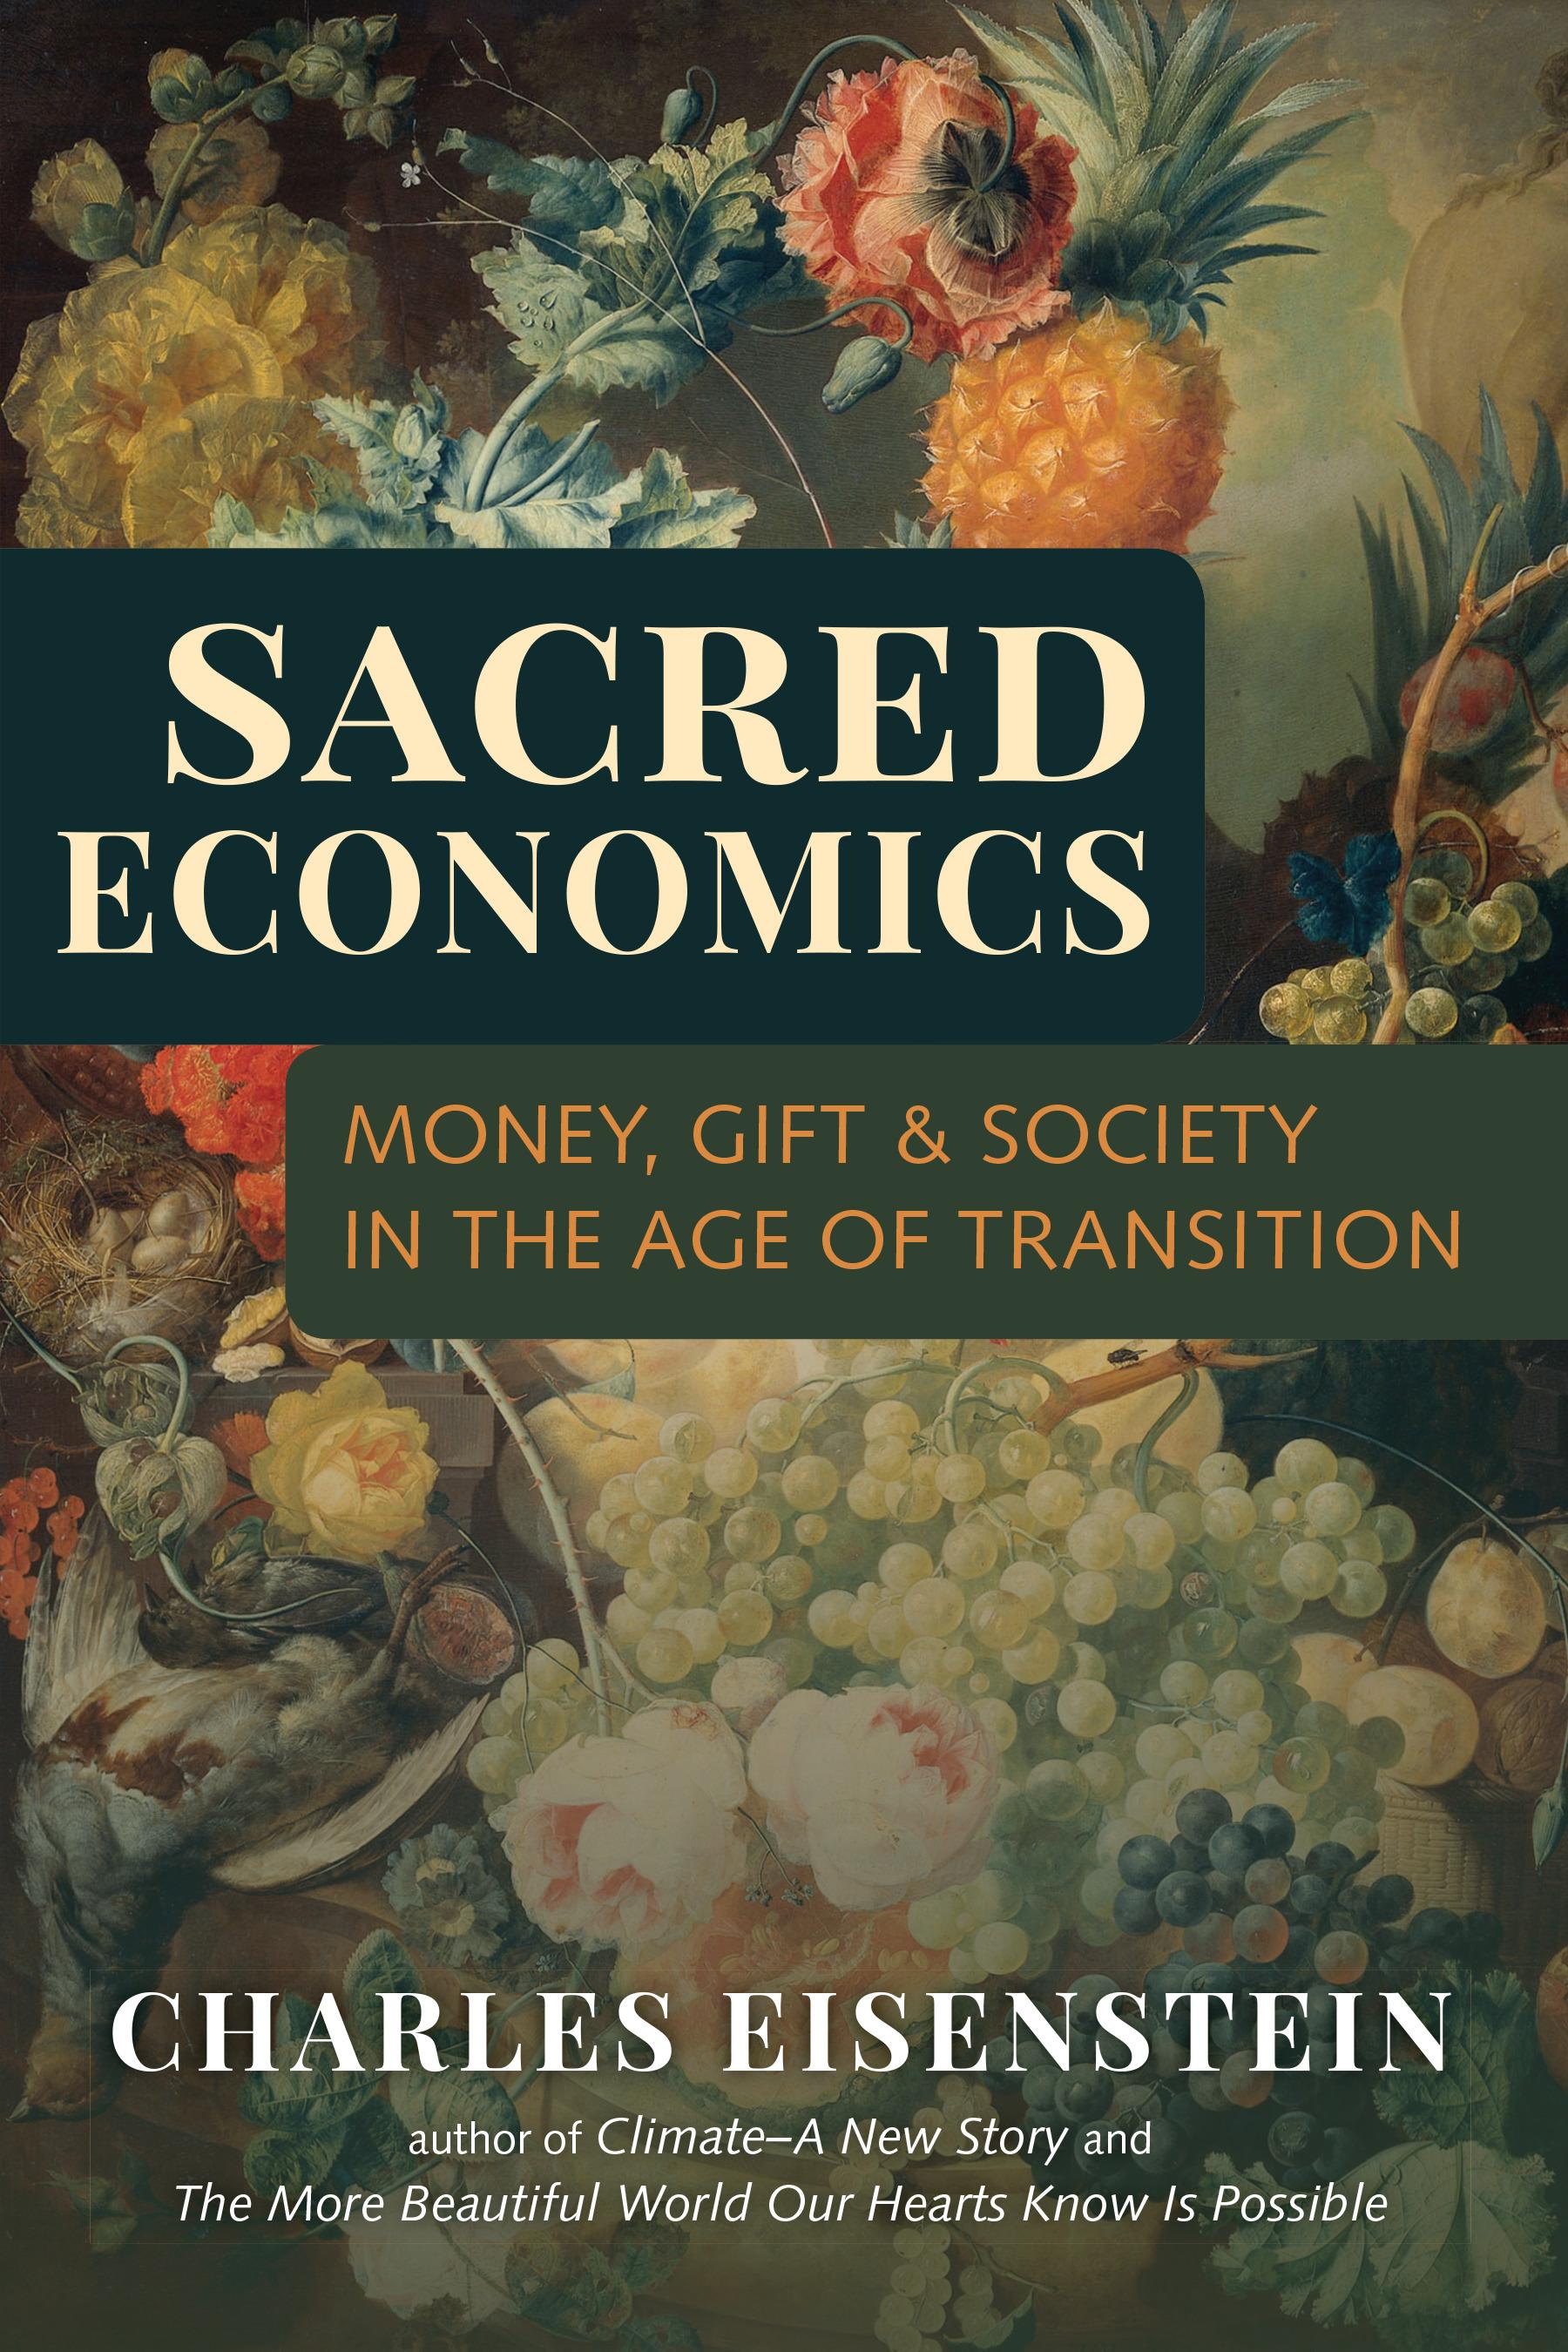 Download Ebook Sacred Economics by Charles Eisenstein Pdf